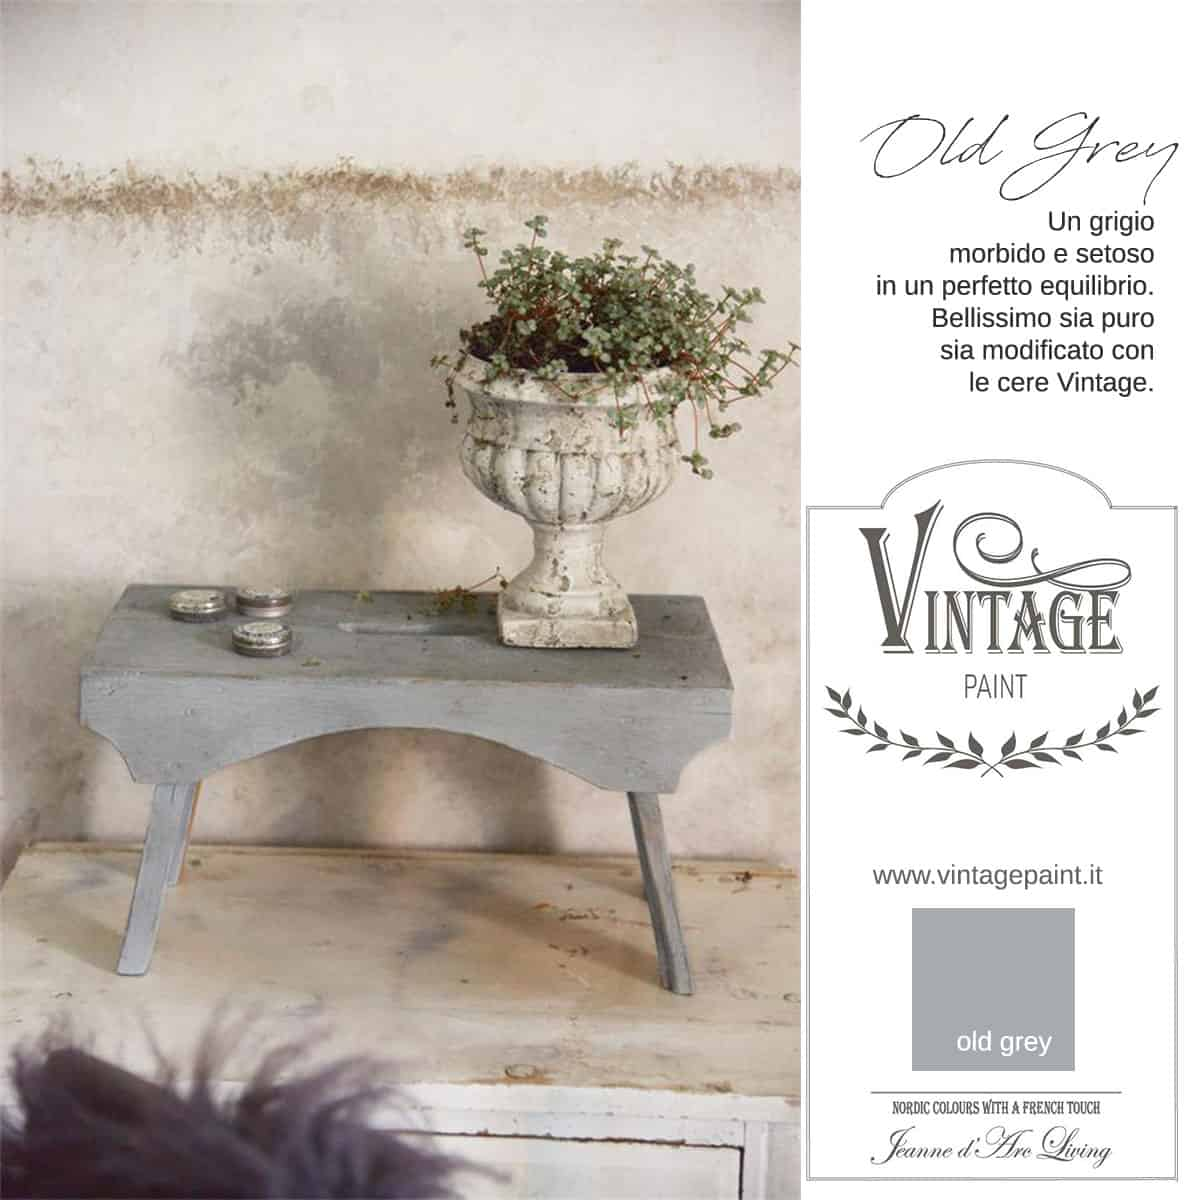 old grey grigio vintage chalk paint vernici shabby chic autentico look gesso